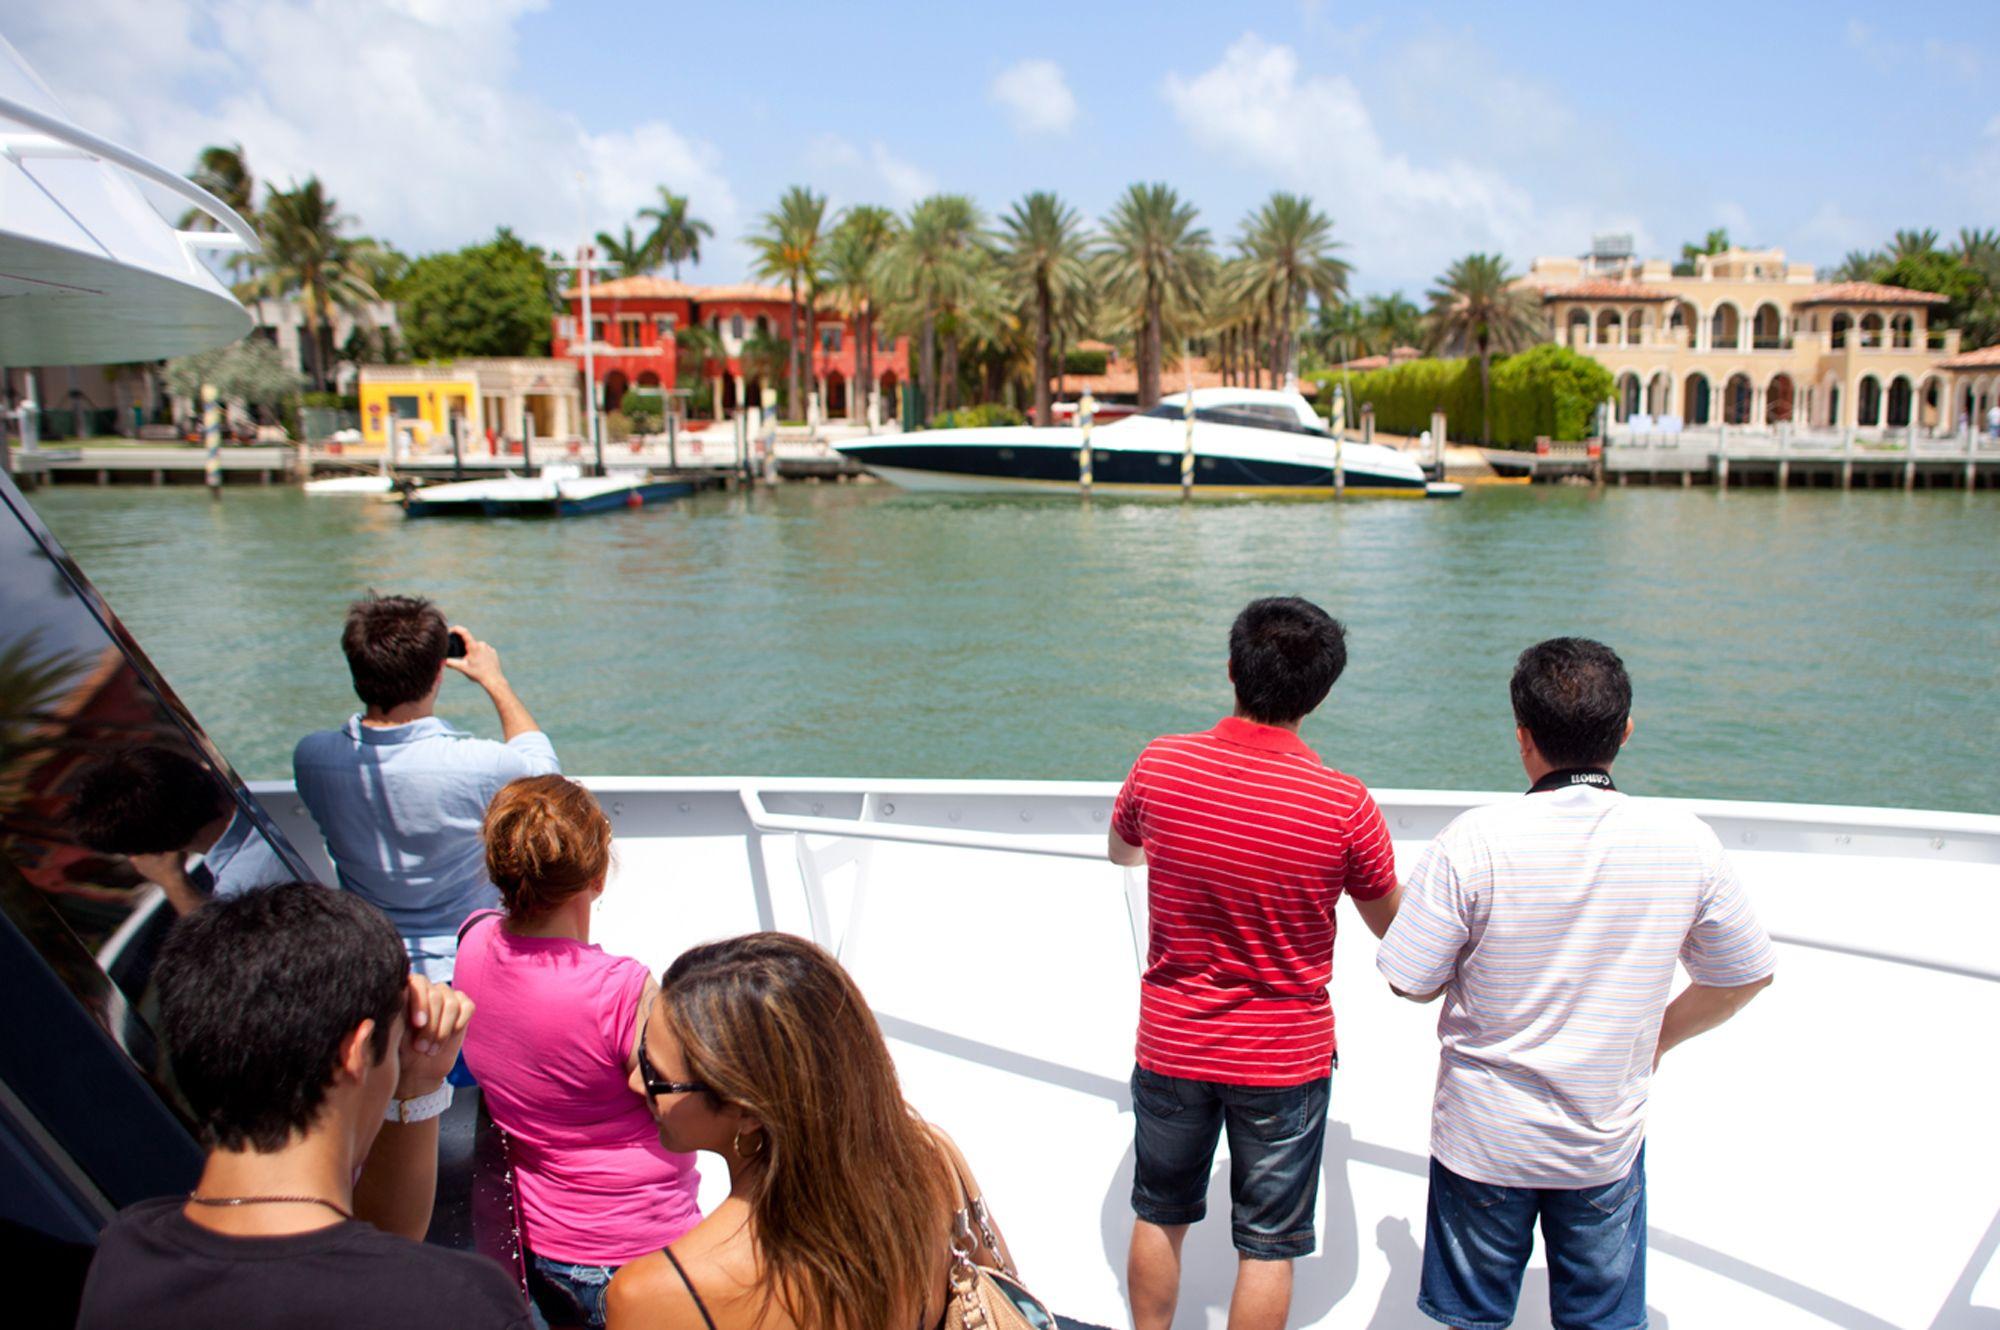 4-boat-tour-miamitourcompany.jpg